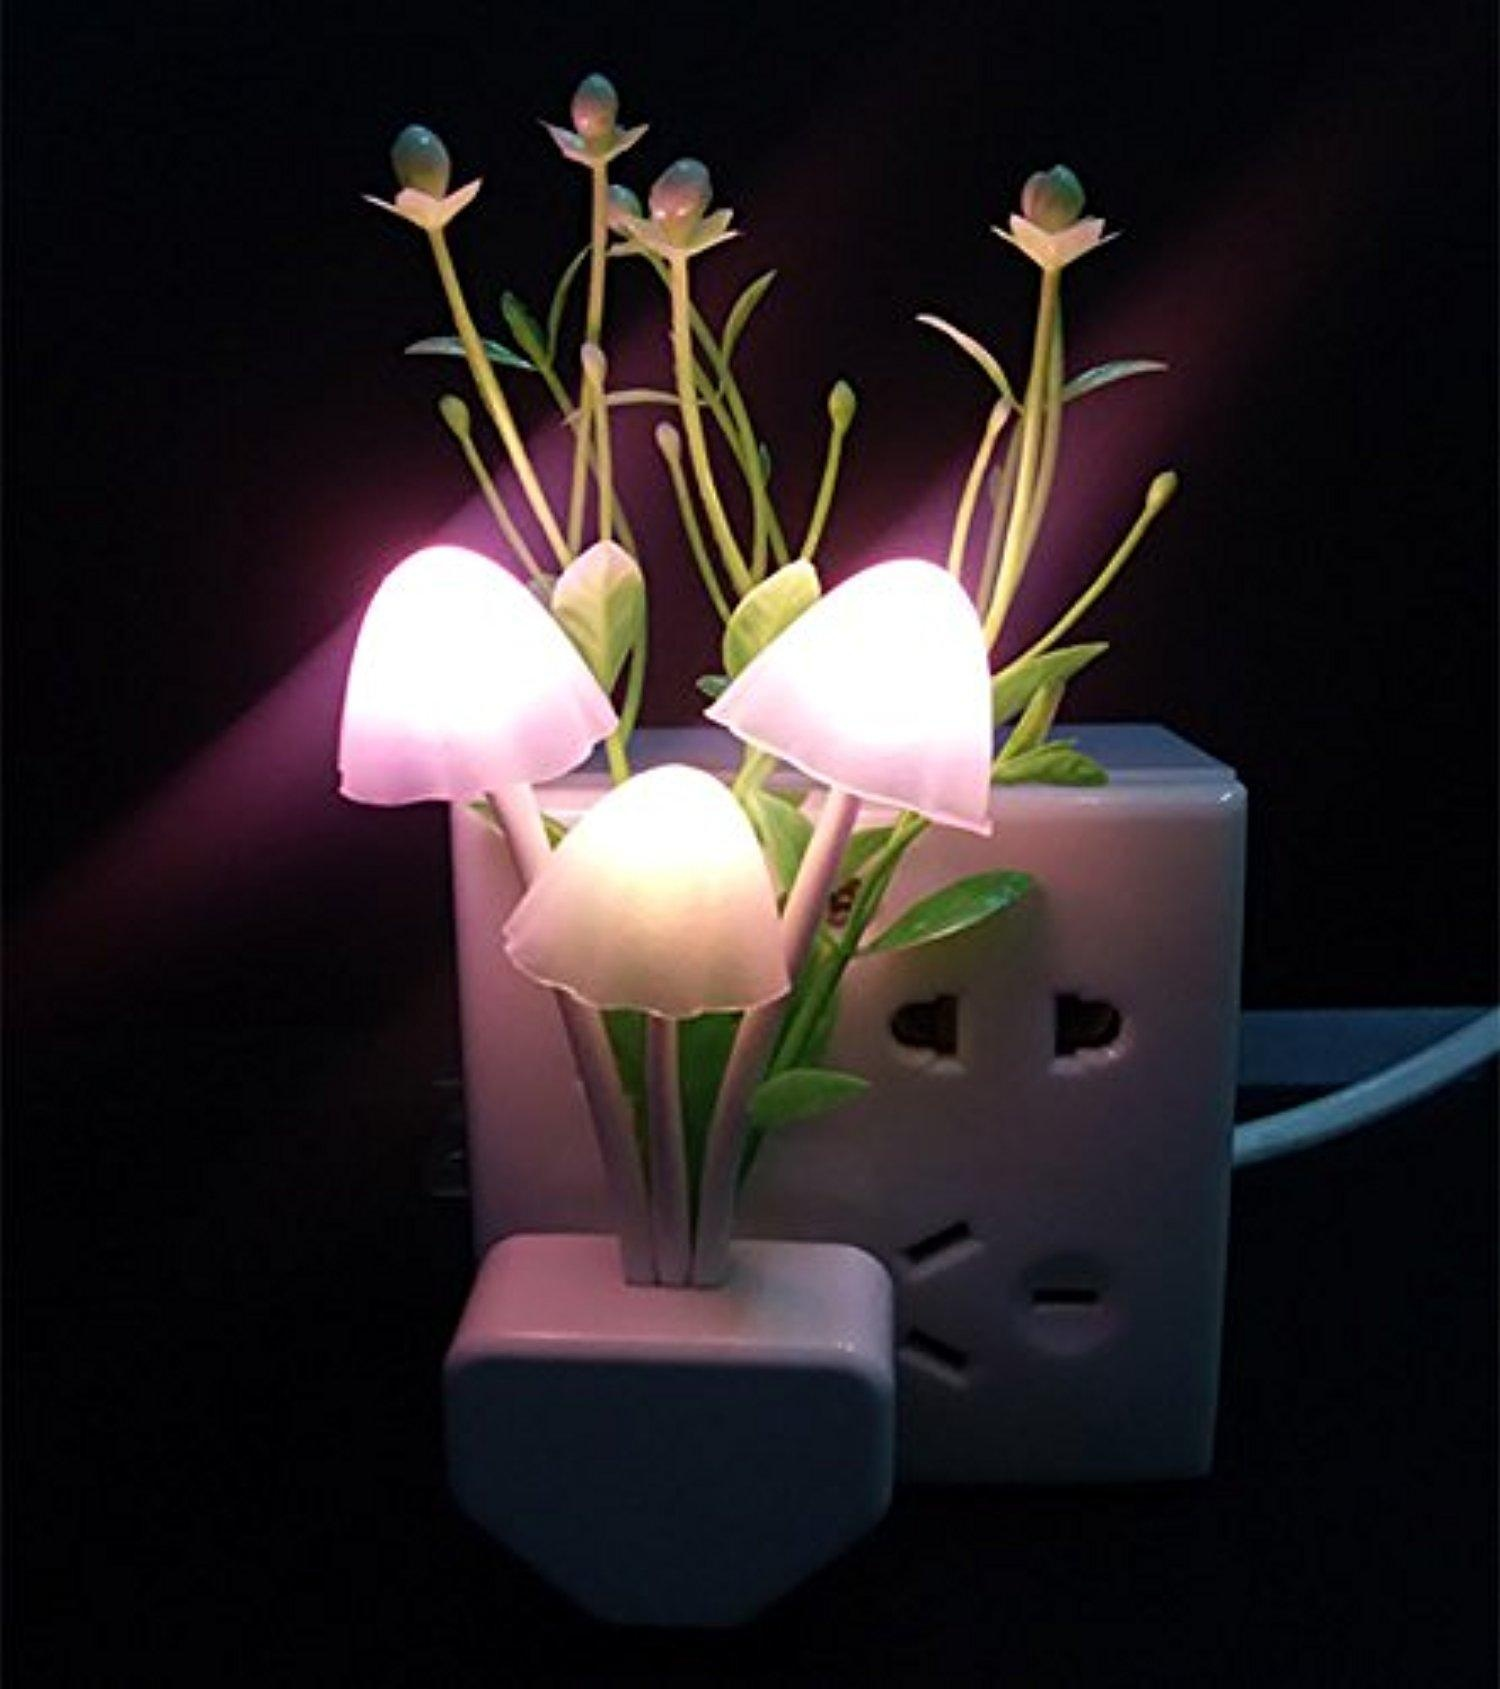 Automatic night lights decorative - Mushroom Led Night Light Lamp Automatic Working At Night Energy Saving Lamps For Children S Room